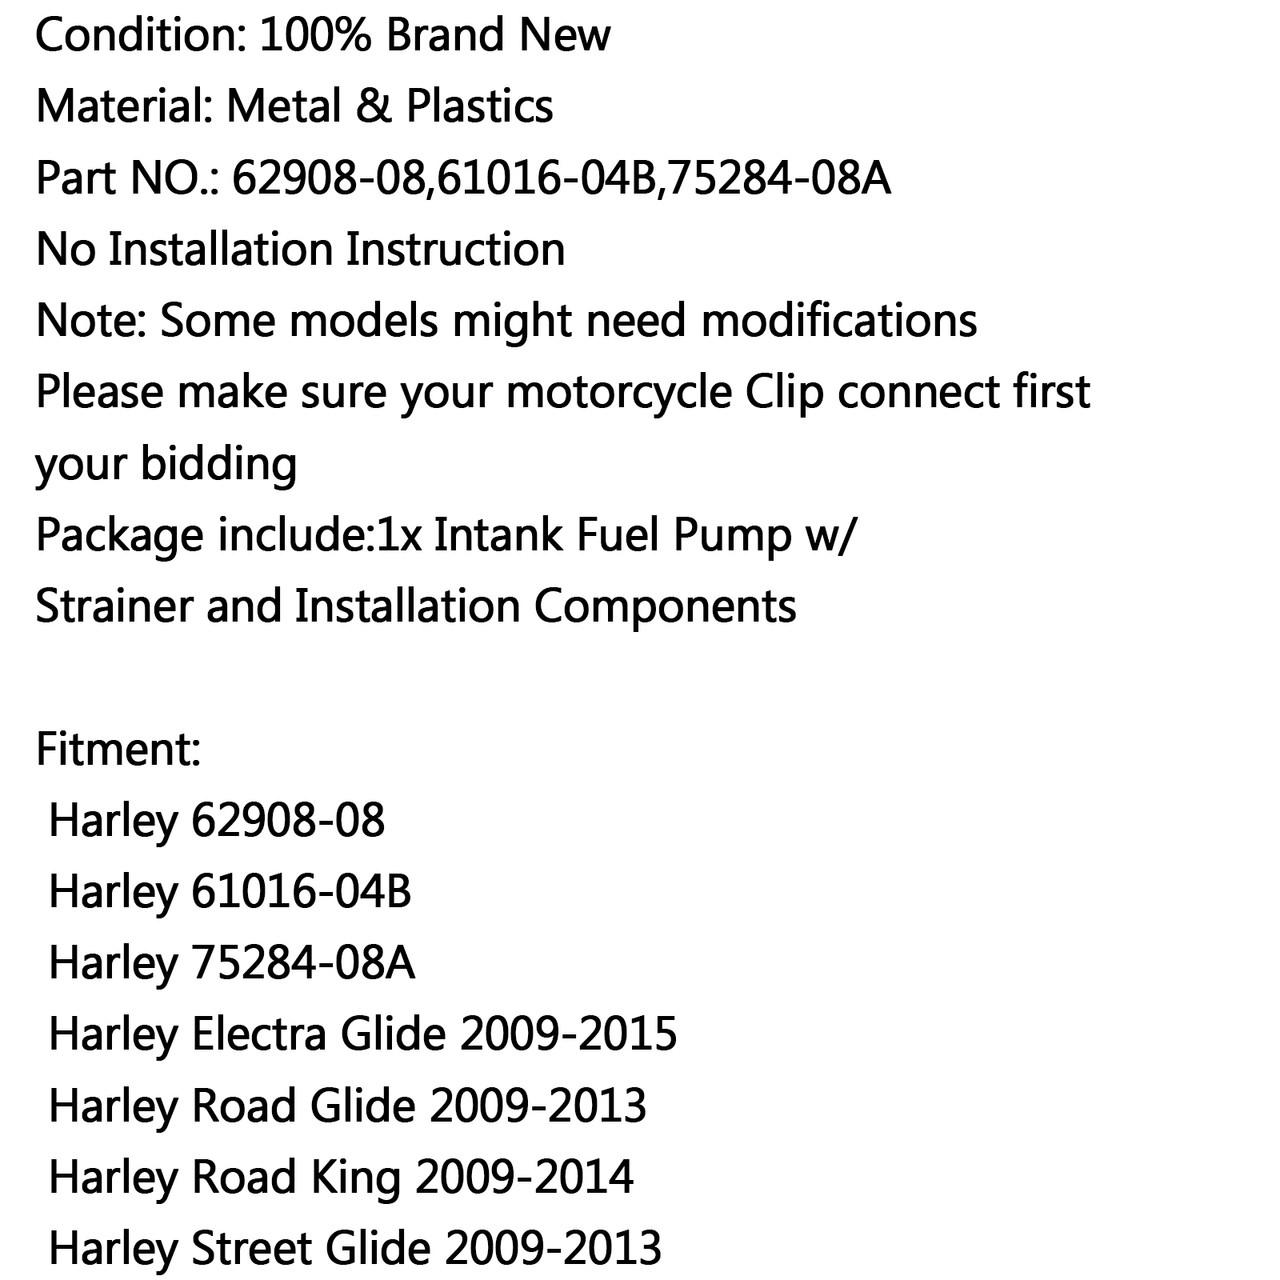 Fuel Pump For Harley 62908-08 61016-04B Electra Glide Road Glide Road King Street Glide Breakout FXSB FXS Heritage Softail Night Train XG500 XG750 Silver